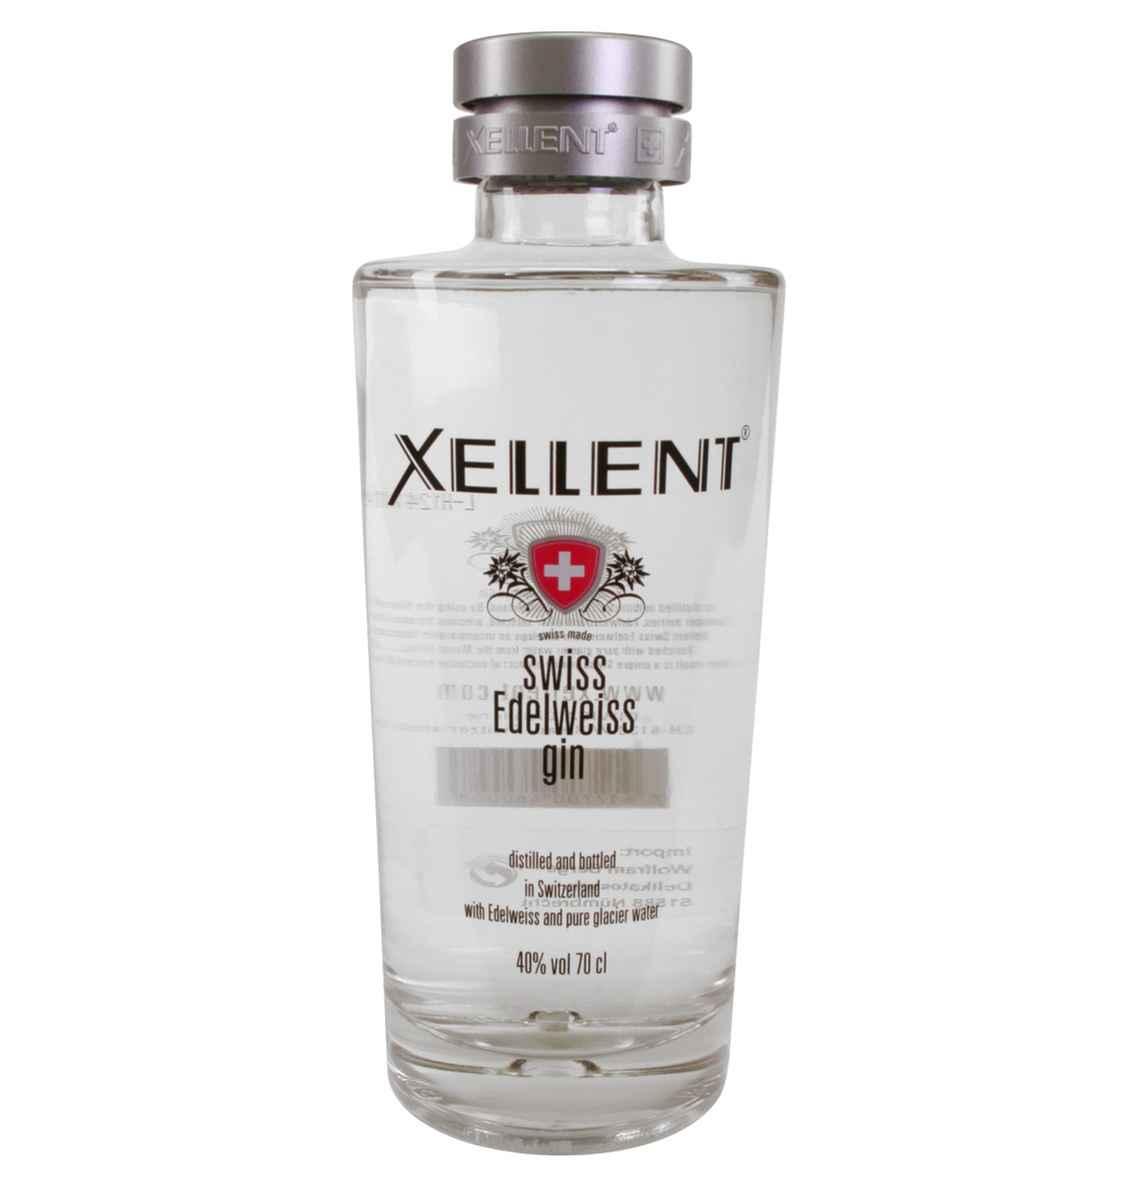 [Galeria Kaufhof] Xellent Swiss Edelweiss Gin oder vodka, 0,7l